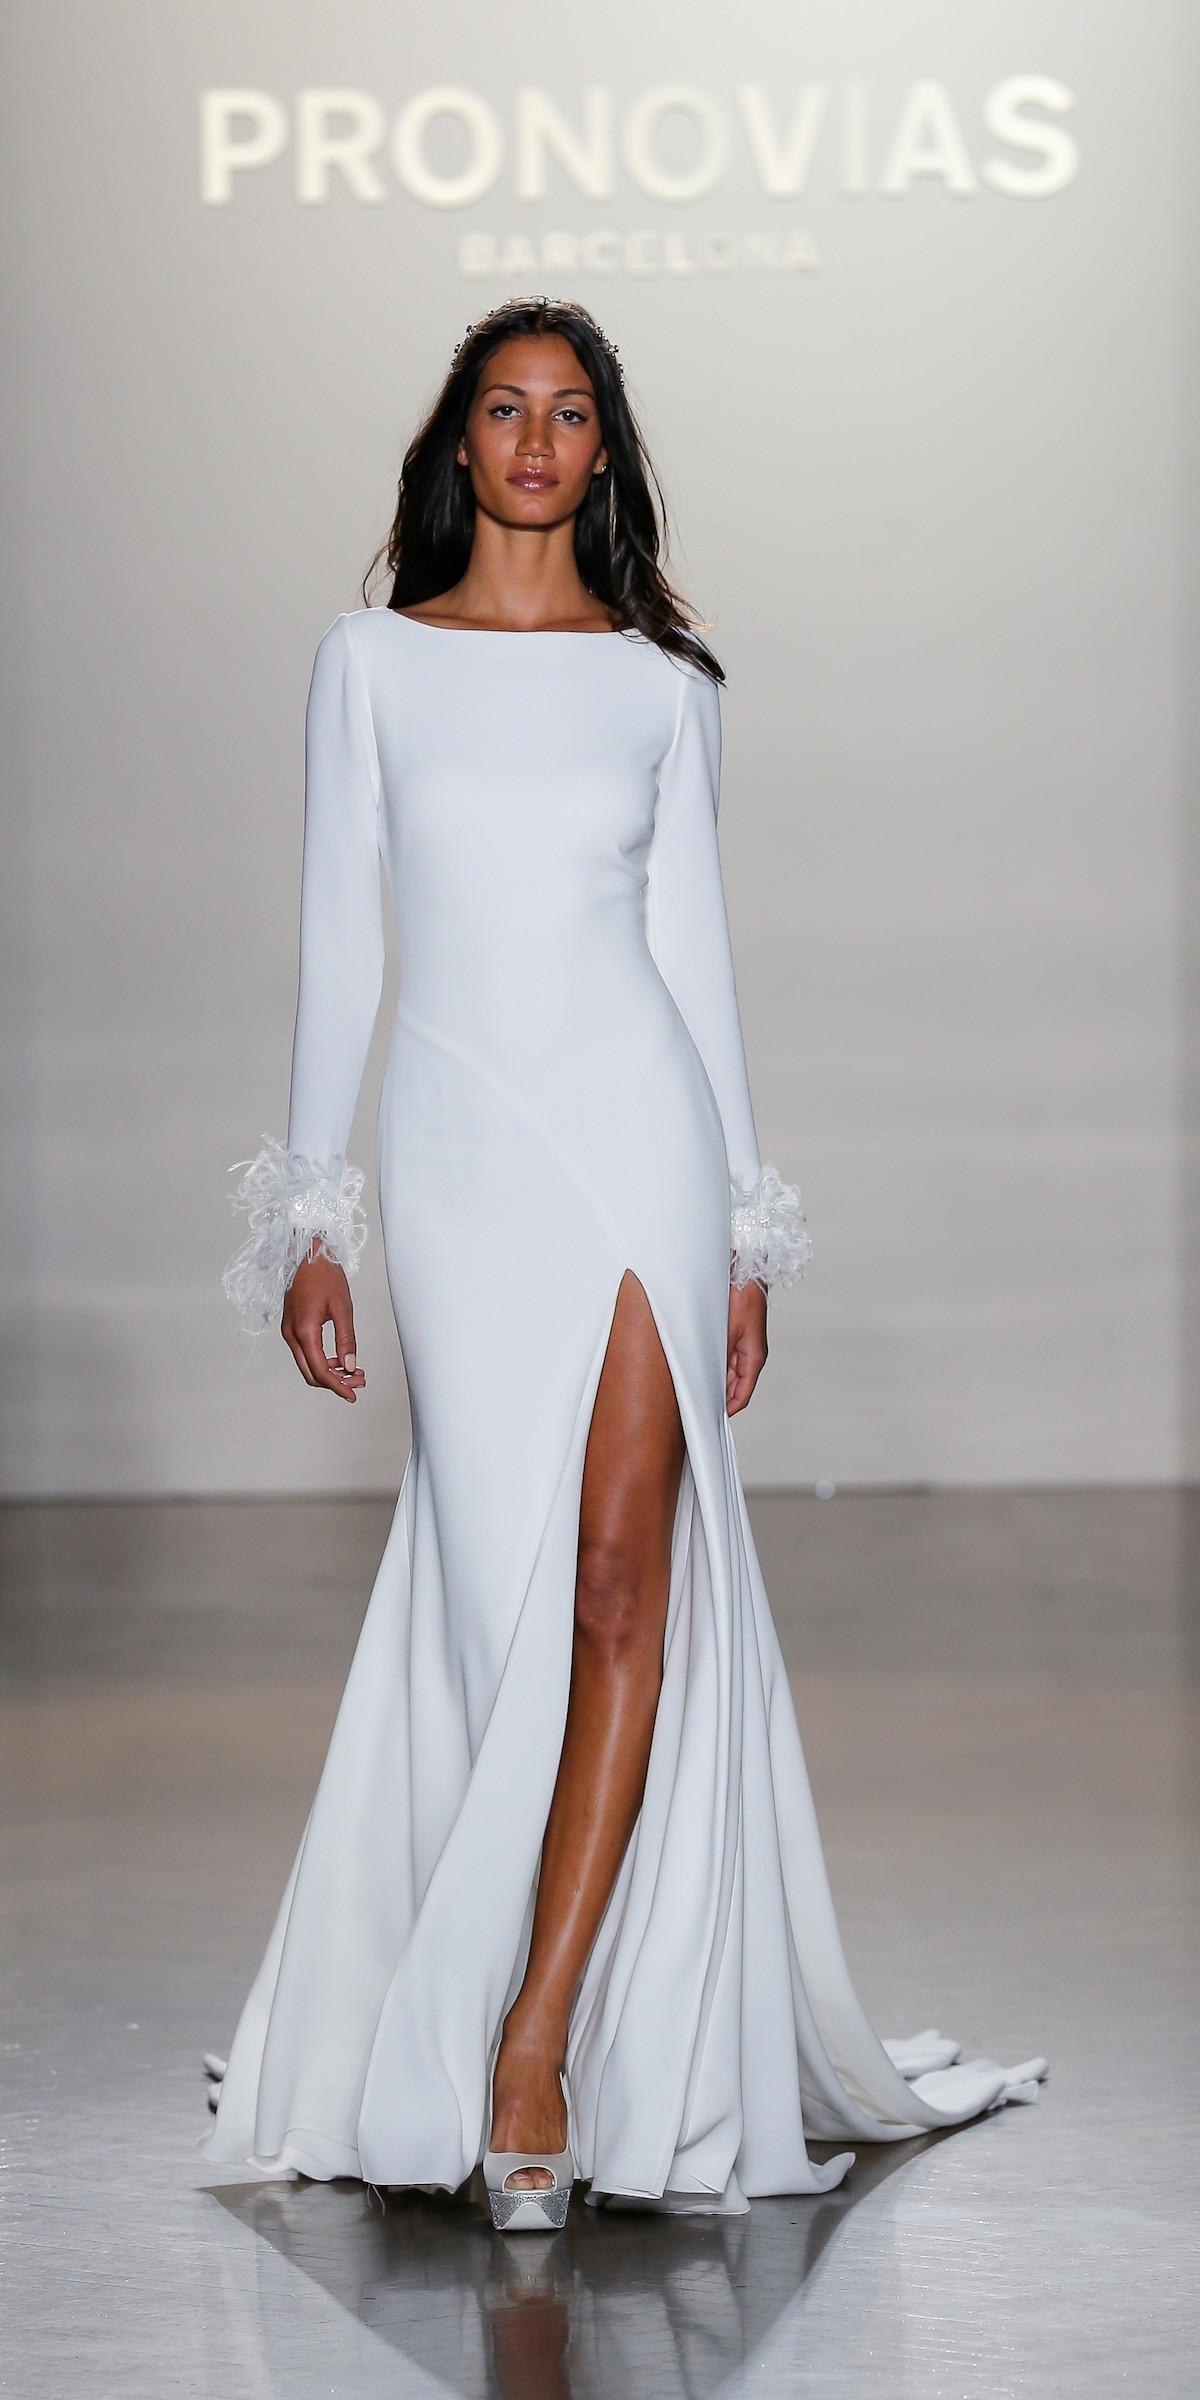 pronovias-ny-fashion-show_nuria